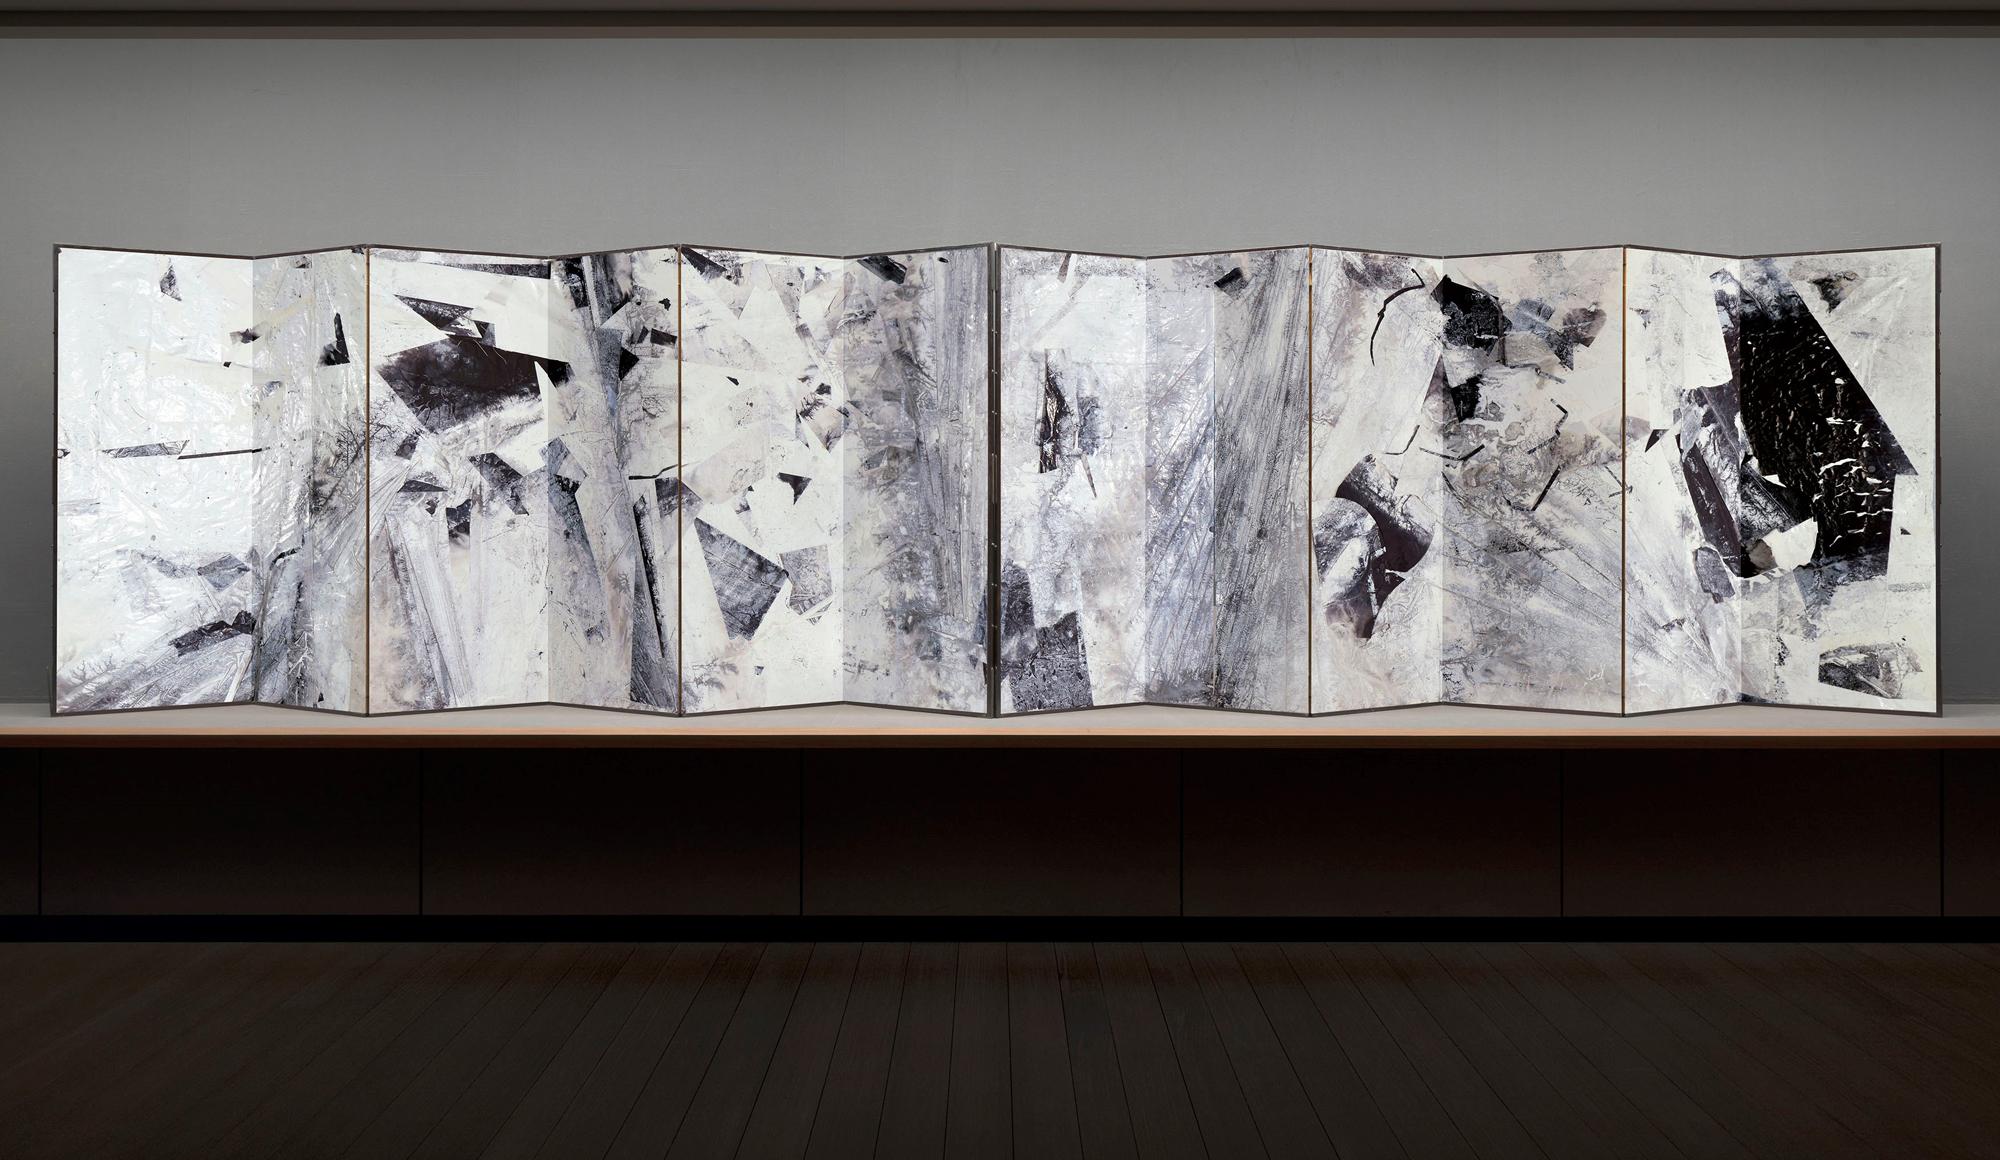 鄭重賓 流動的尺寸 Zheng Chongbin: Dimension and Flow